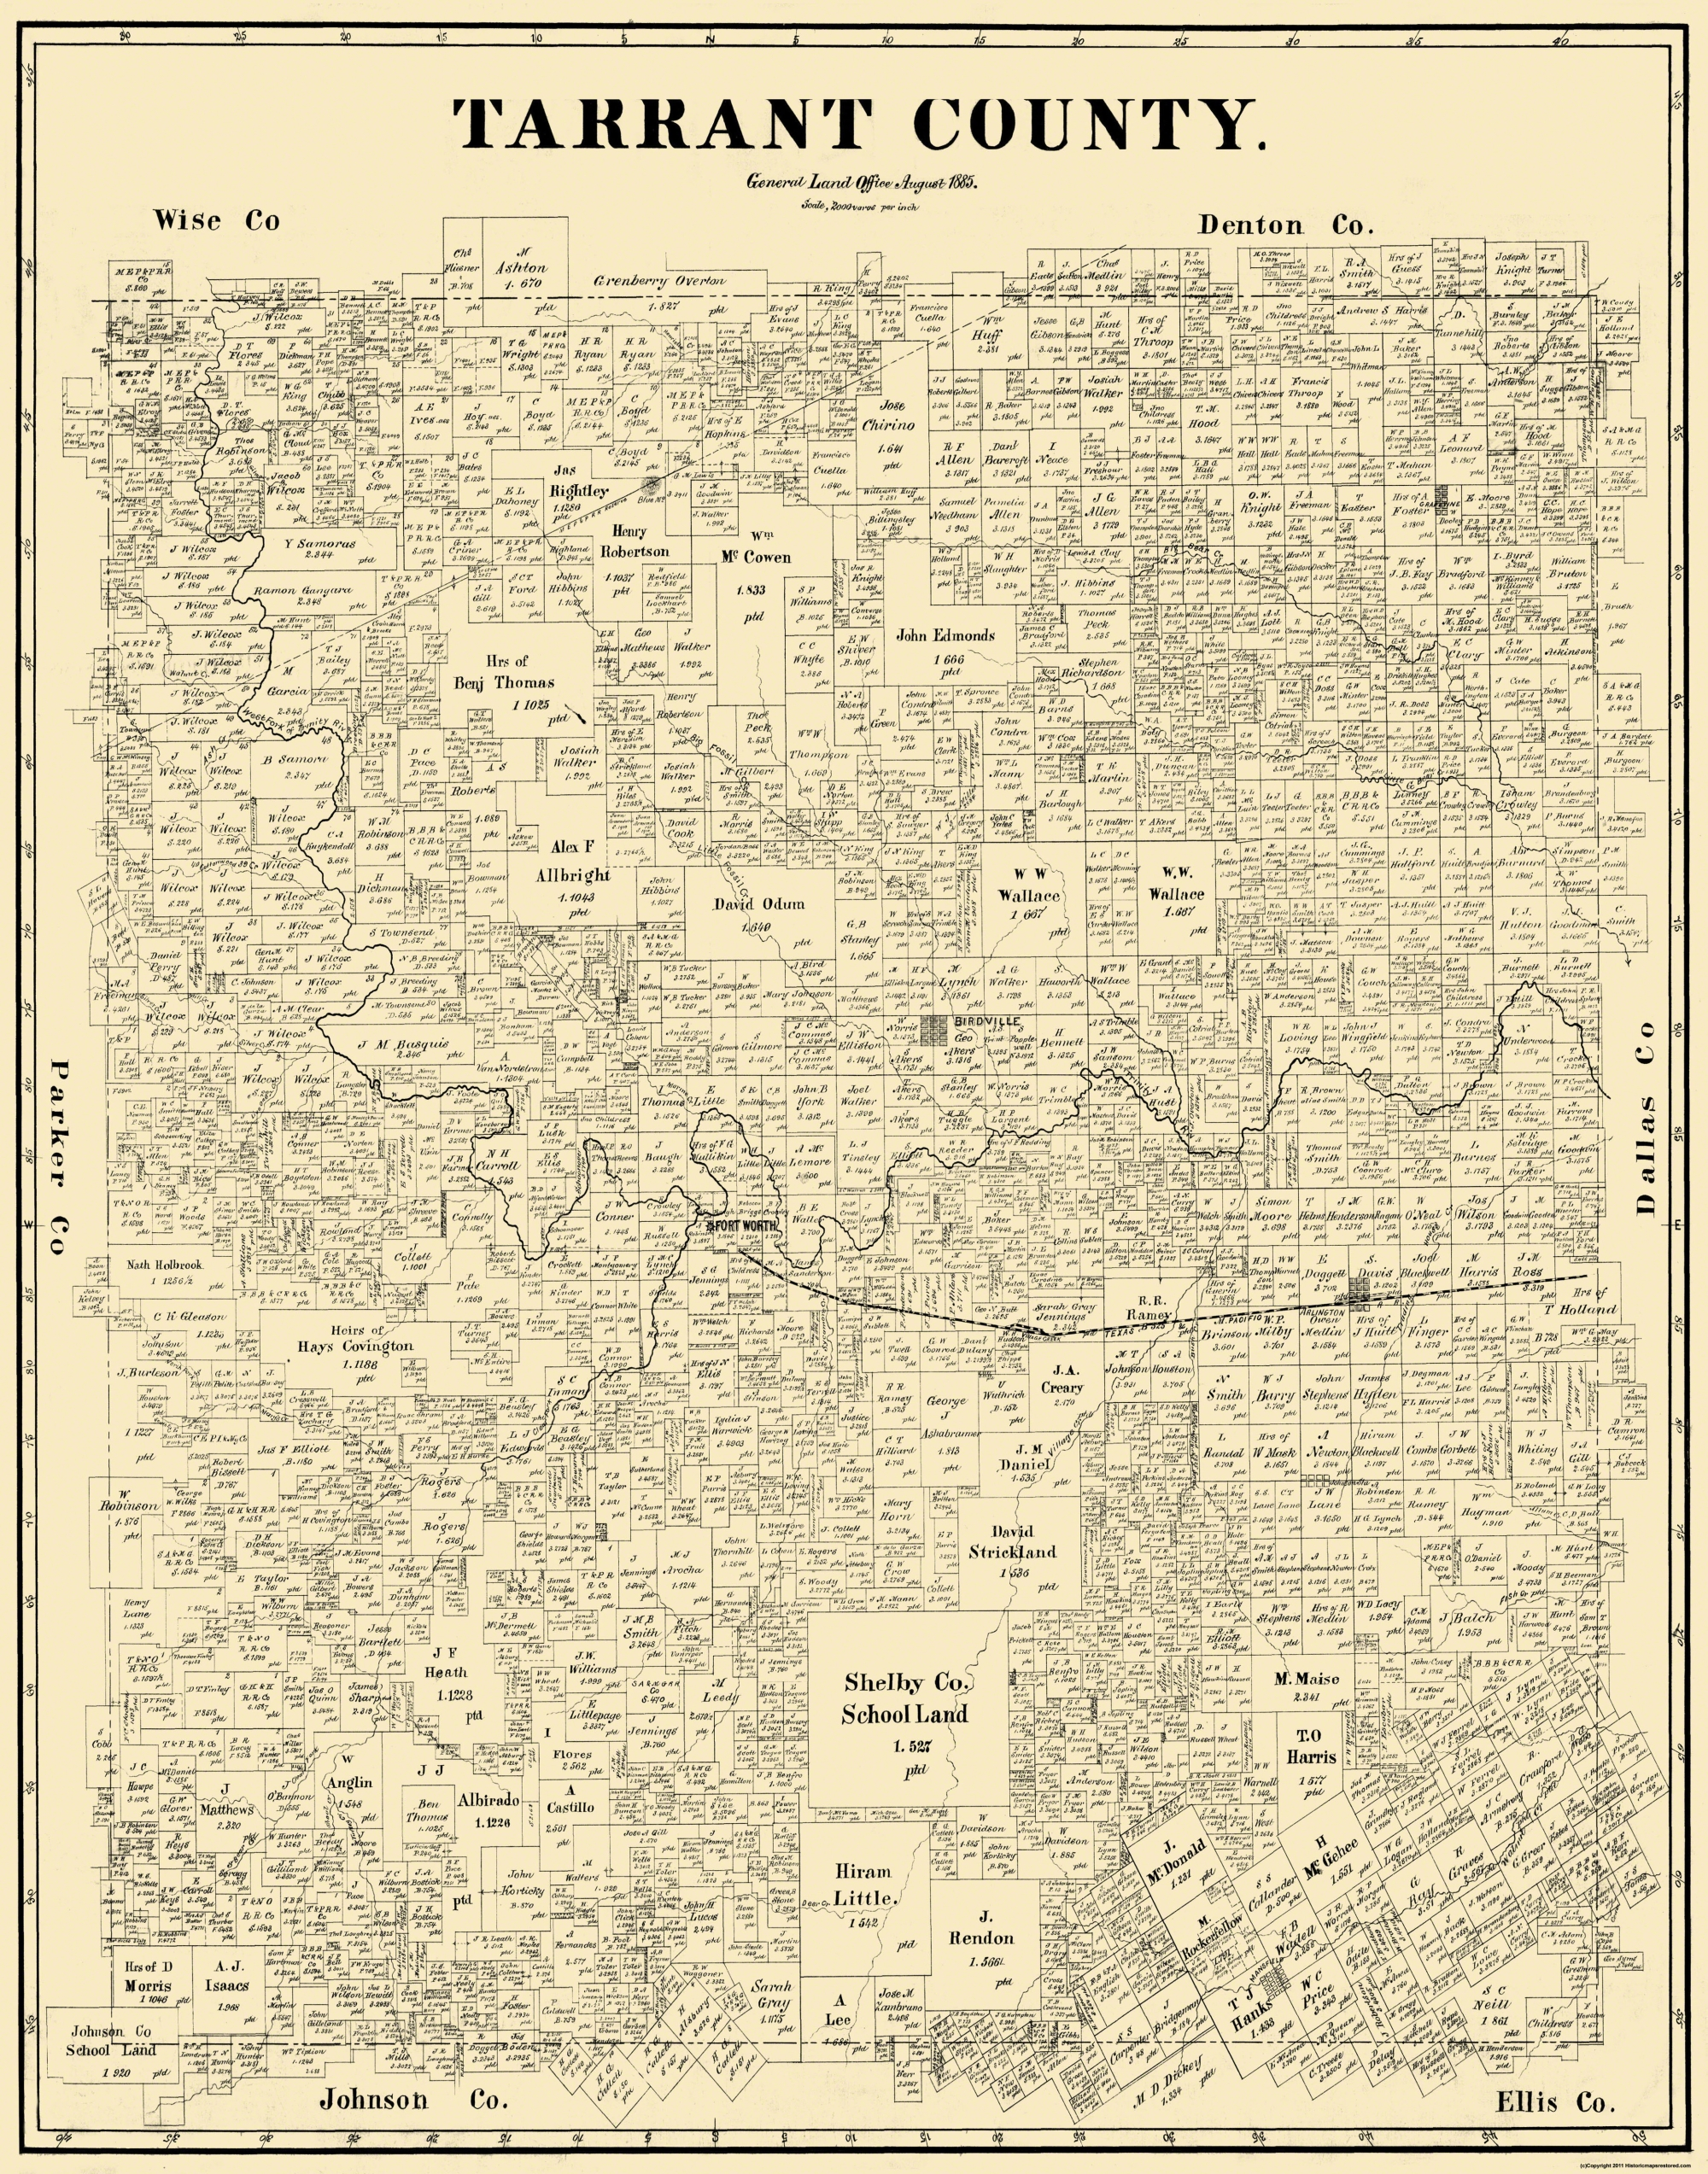 Old County Map Tarrant Texas Landowner - County maps of texas